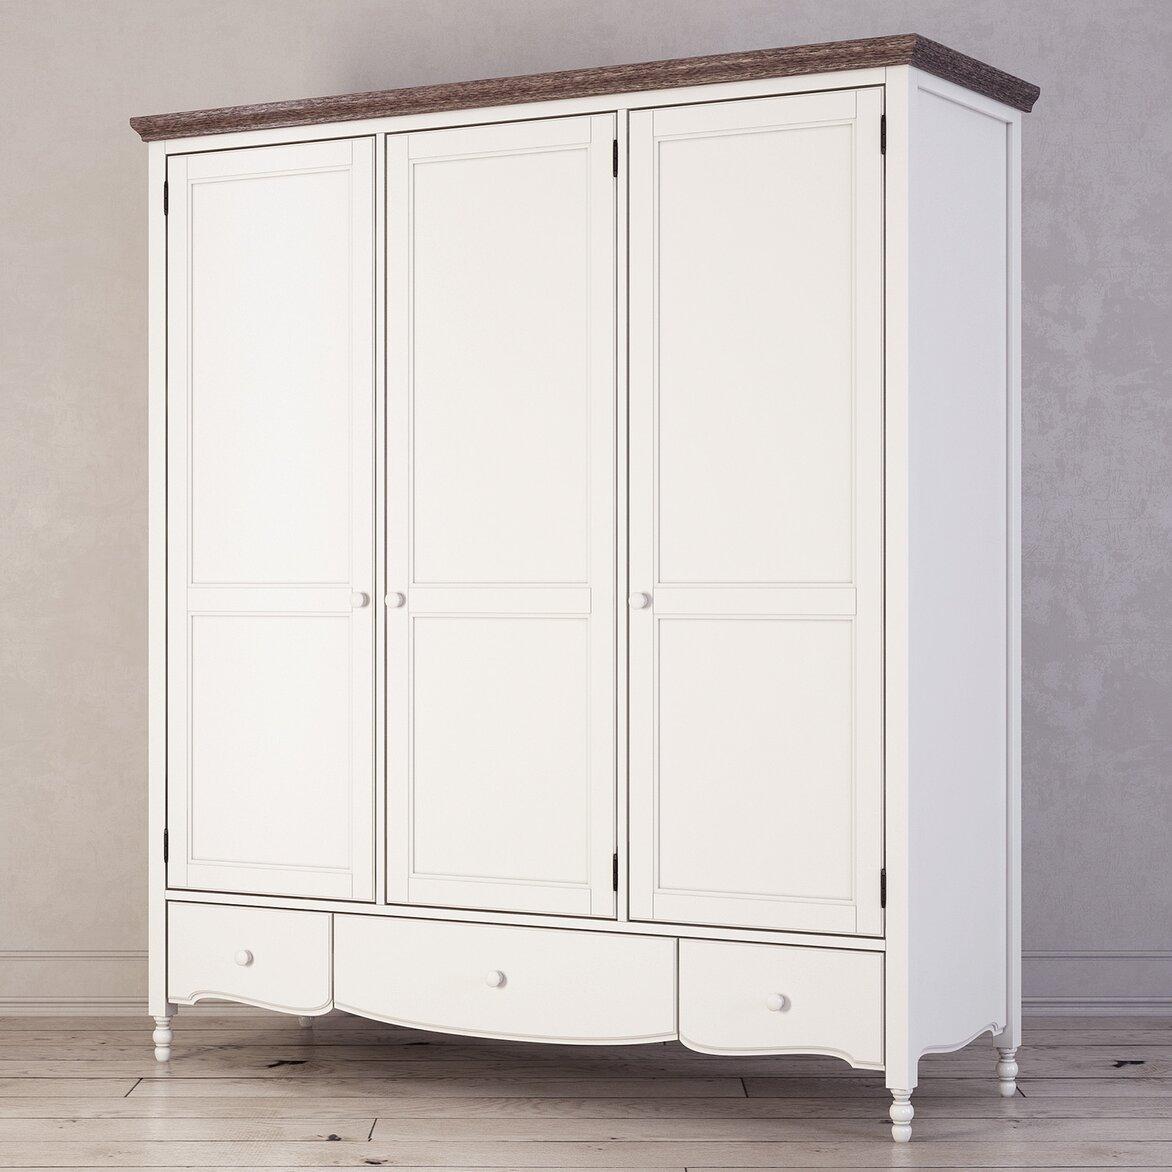 Шкаф трехстворчатый Leblanc, белый (полуоборот)